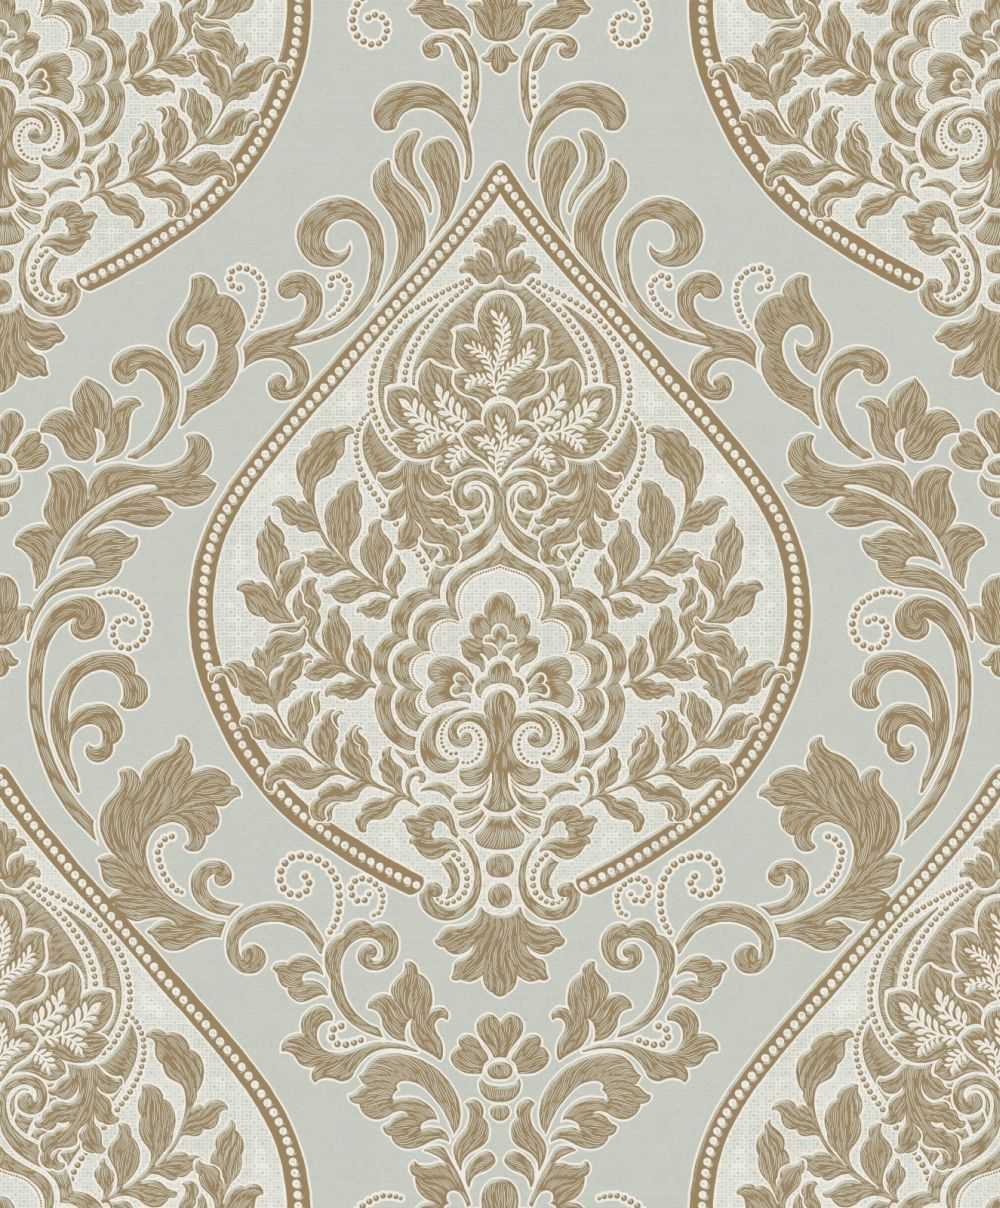 Thankful Soft Green wallpaper by Vymura Fabric wallpaper